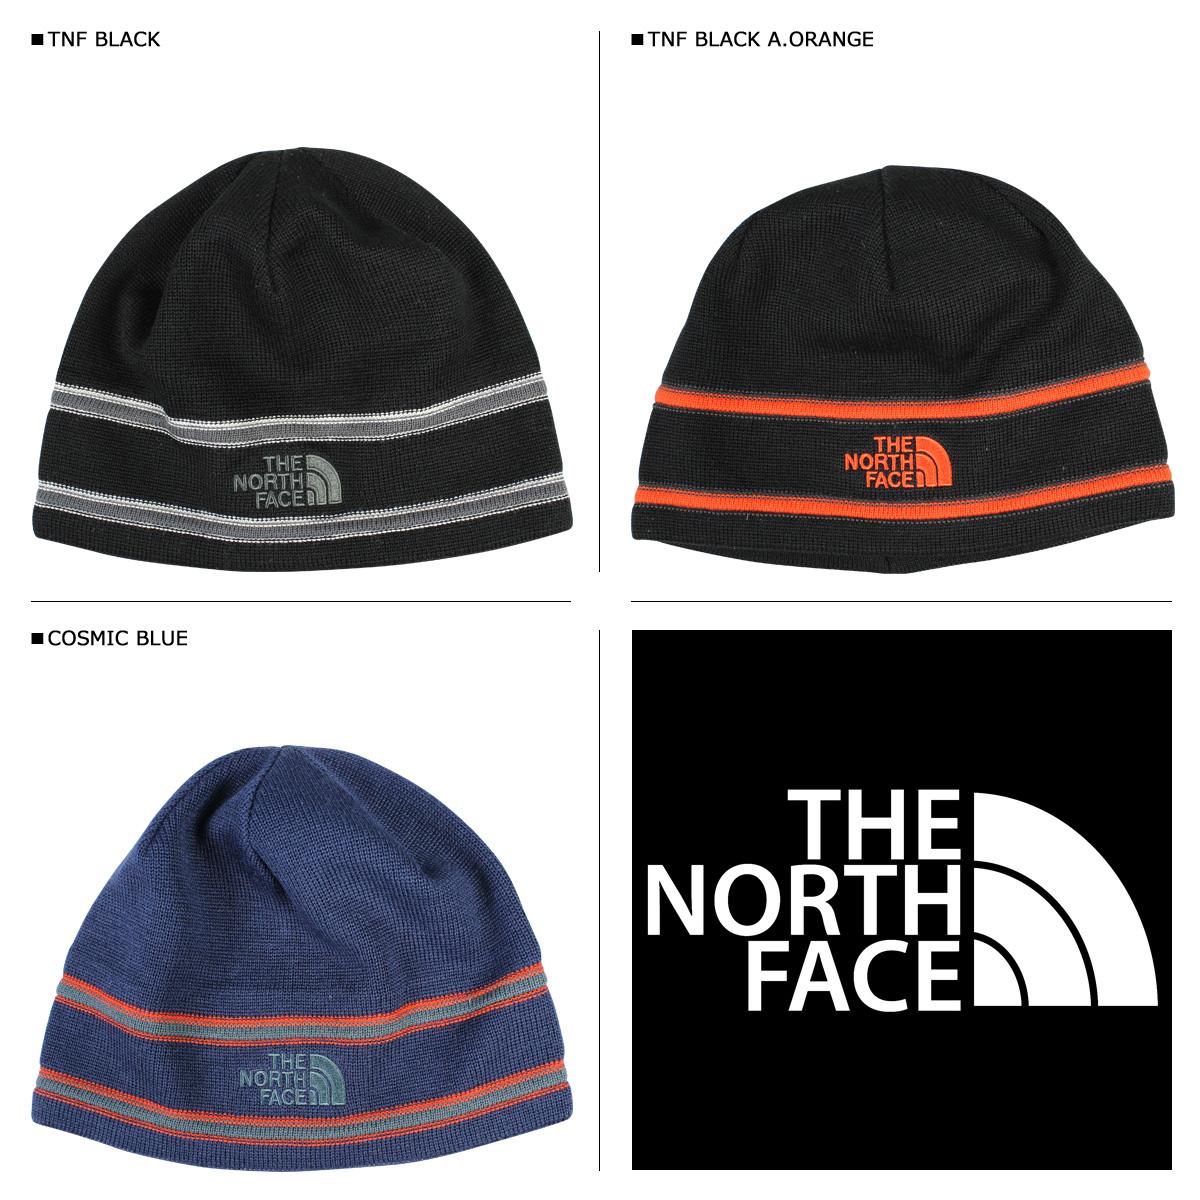 3c4ef714b4c3ea ... THE NORTH FACE north face knit hat Beanie knit Cap LOGO BEANIE men's  women's ...